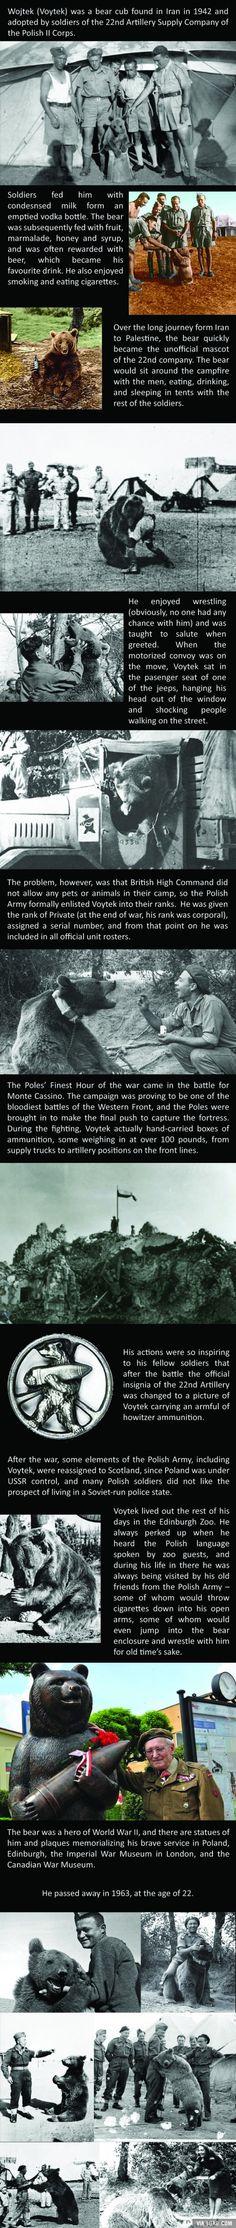 The amazing story of Voytek the Soldier Bear